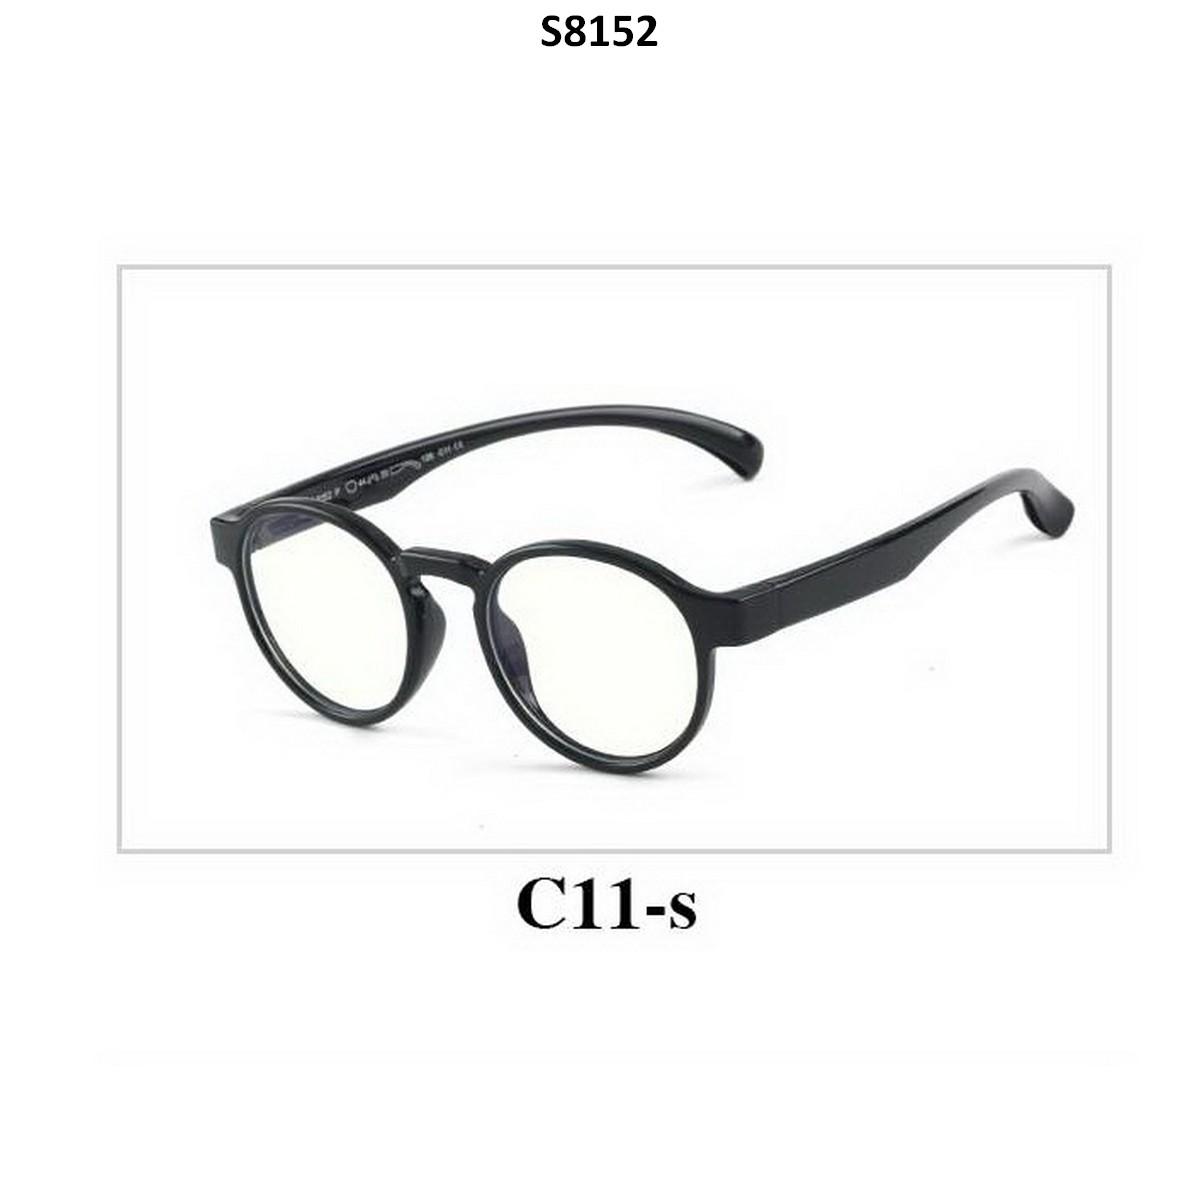 Kids Blue Light Blocker Computer Glasses Anti Blue Ray Eyeglasses S8152C11